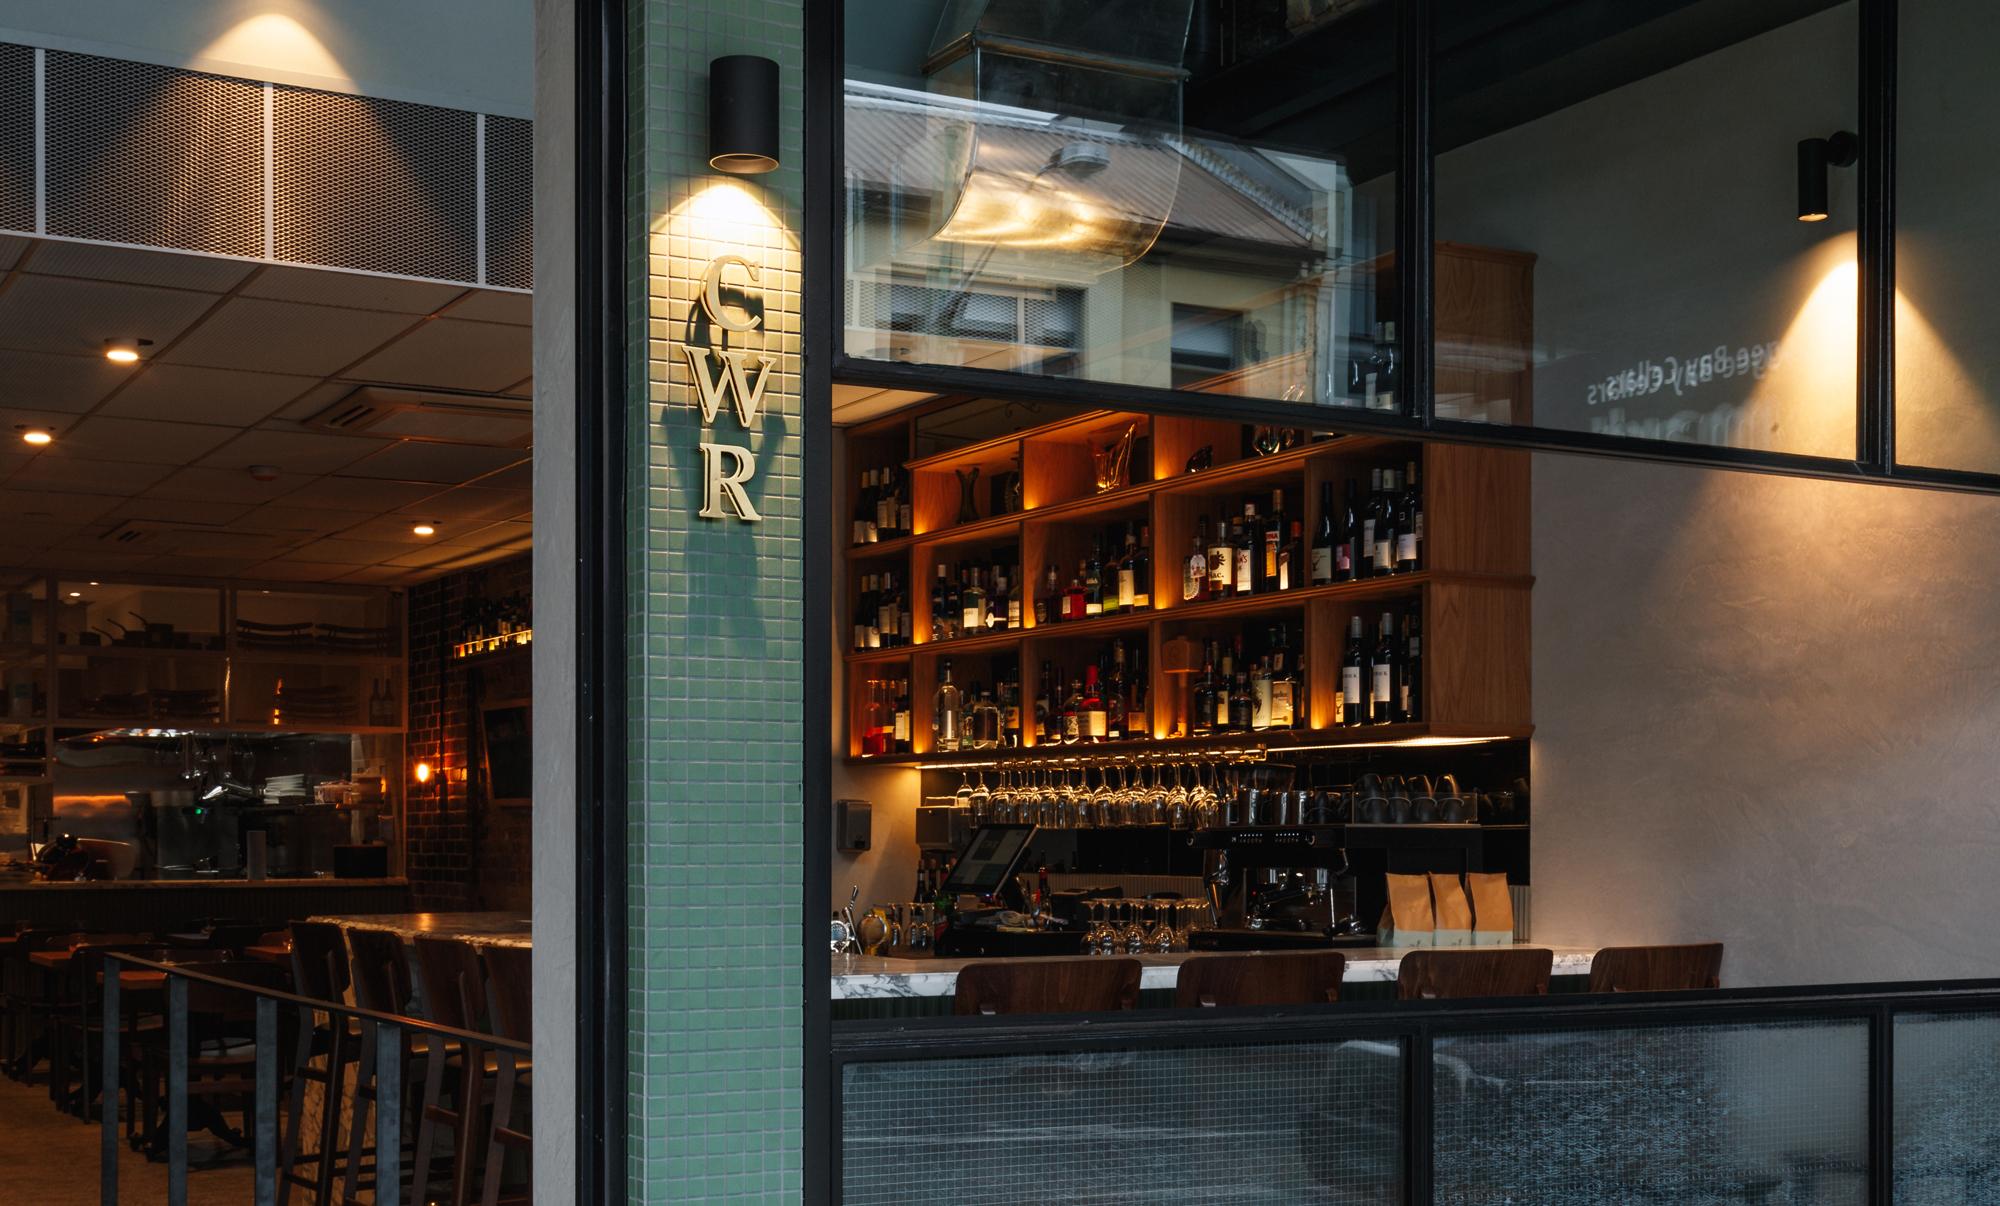 sydney design social coogee wine room front facade logo branding